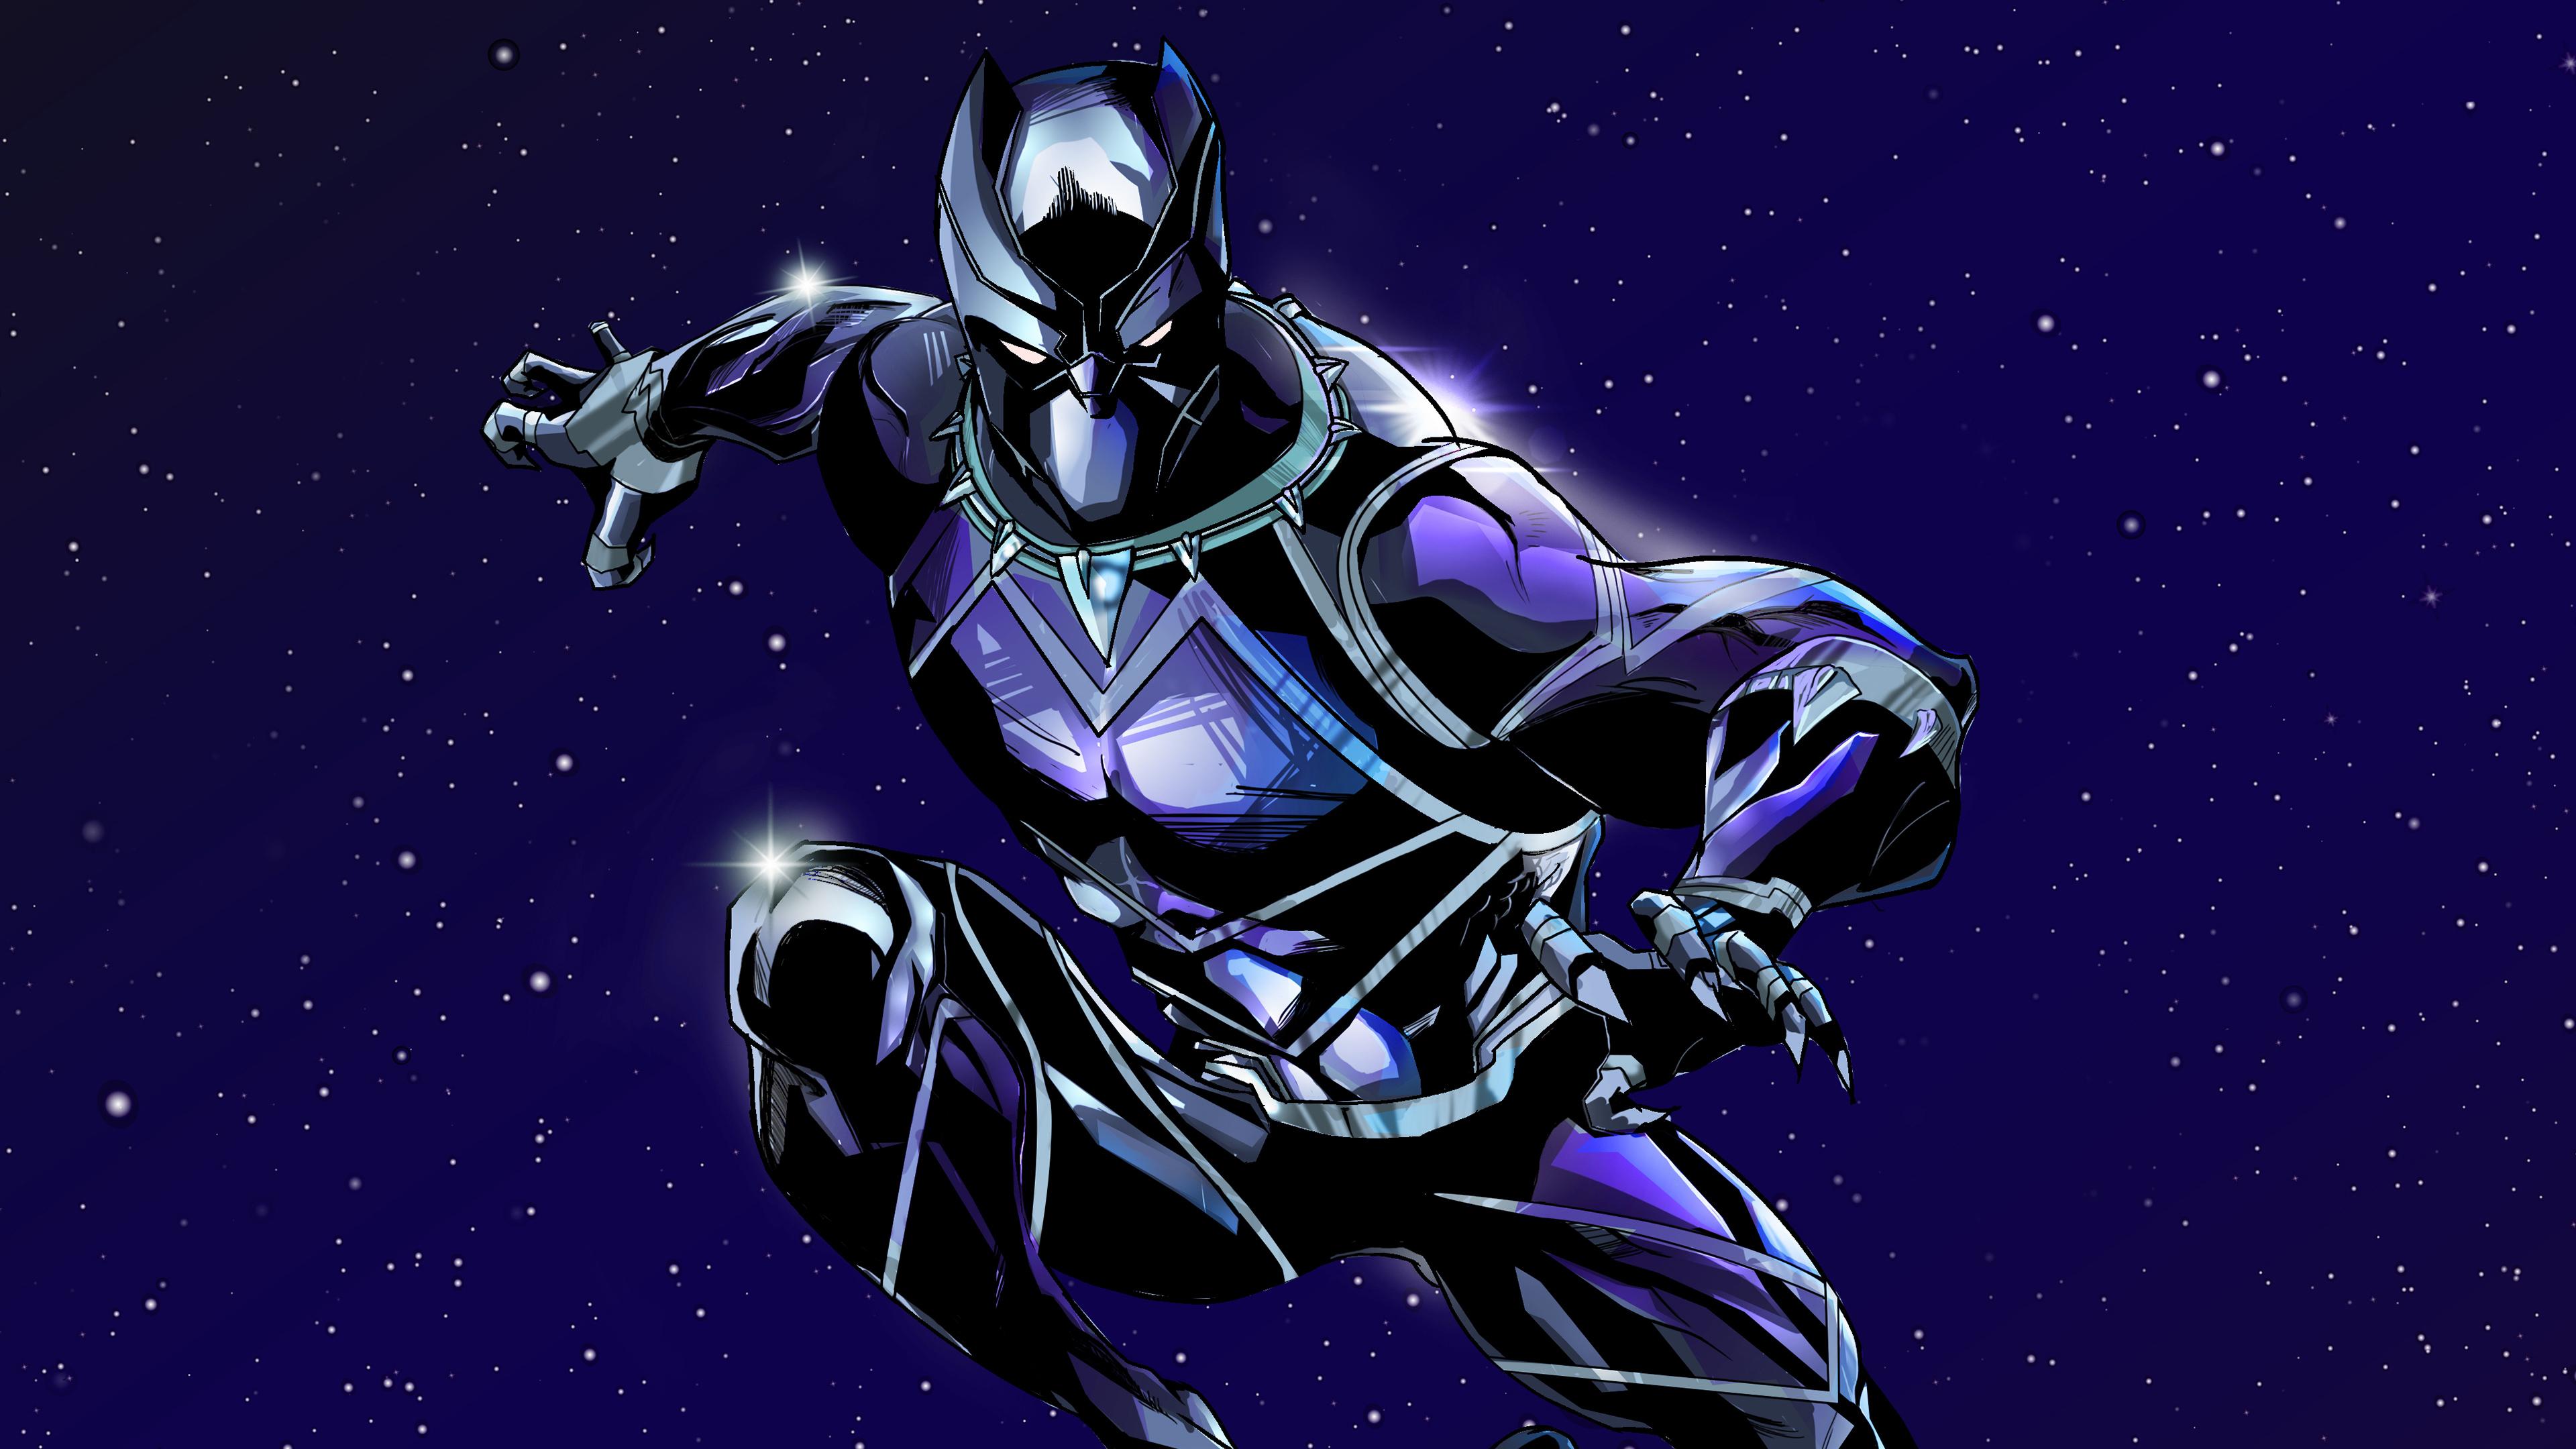 Black Panther 4k New Artwork, HD Superheroes, 4k ...